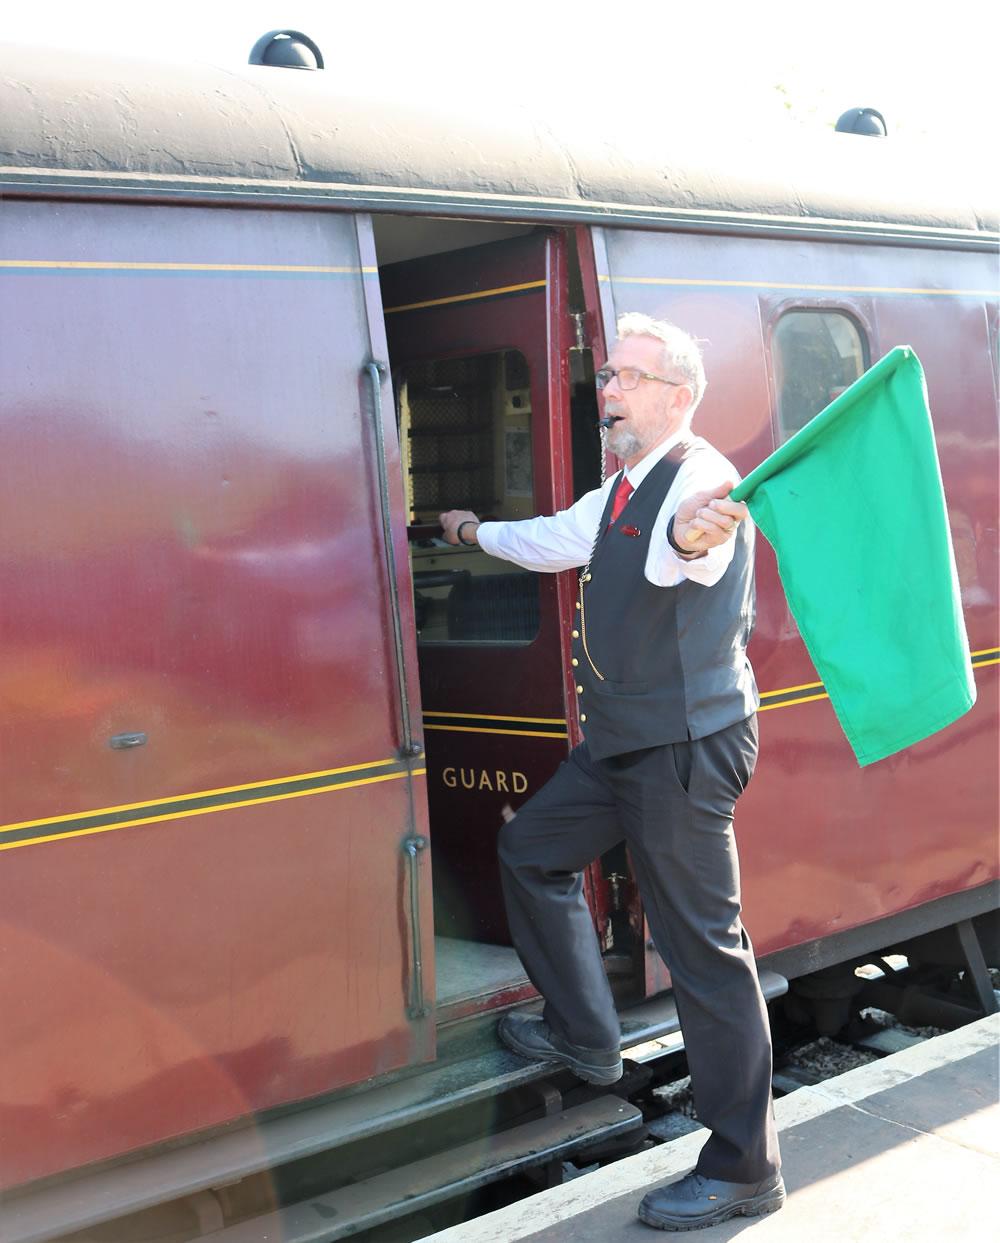 Guard send off the train Green Flag